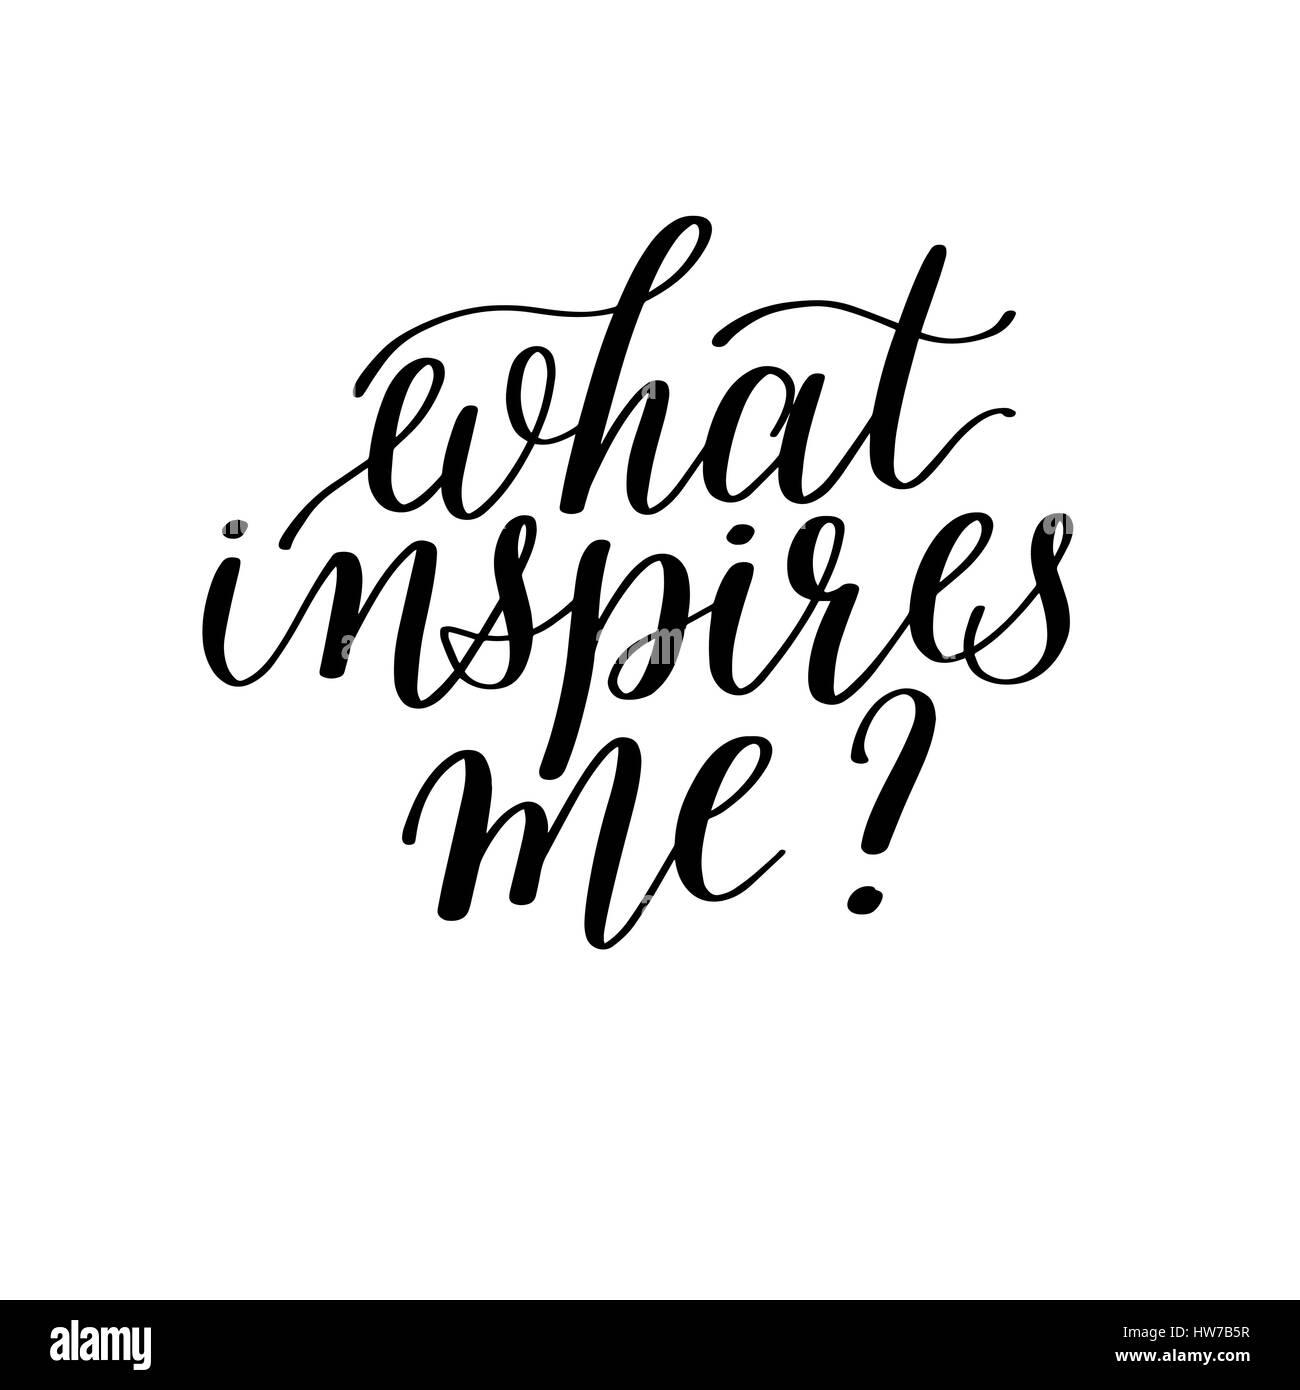 what inspires me? - hand written lettering motivation positive q - Stock Vector